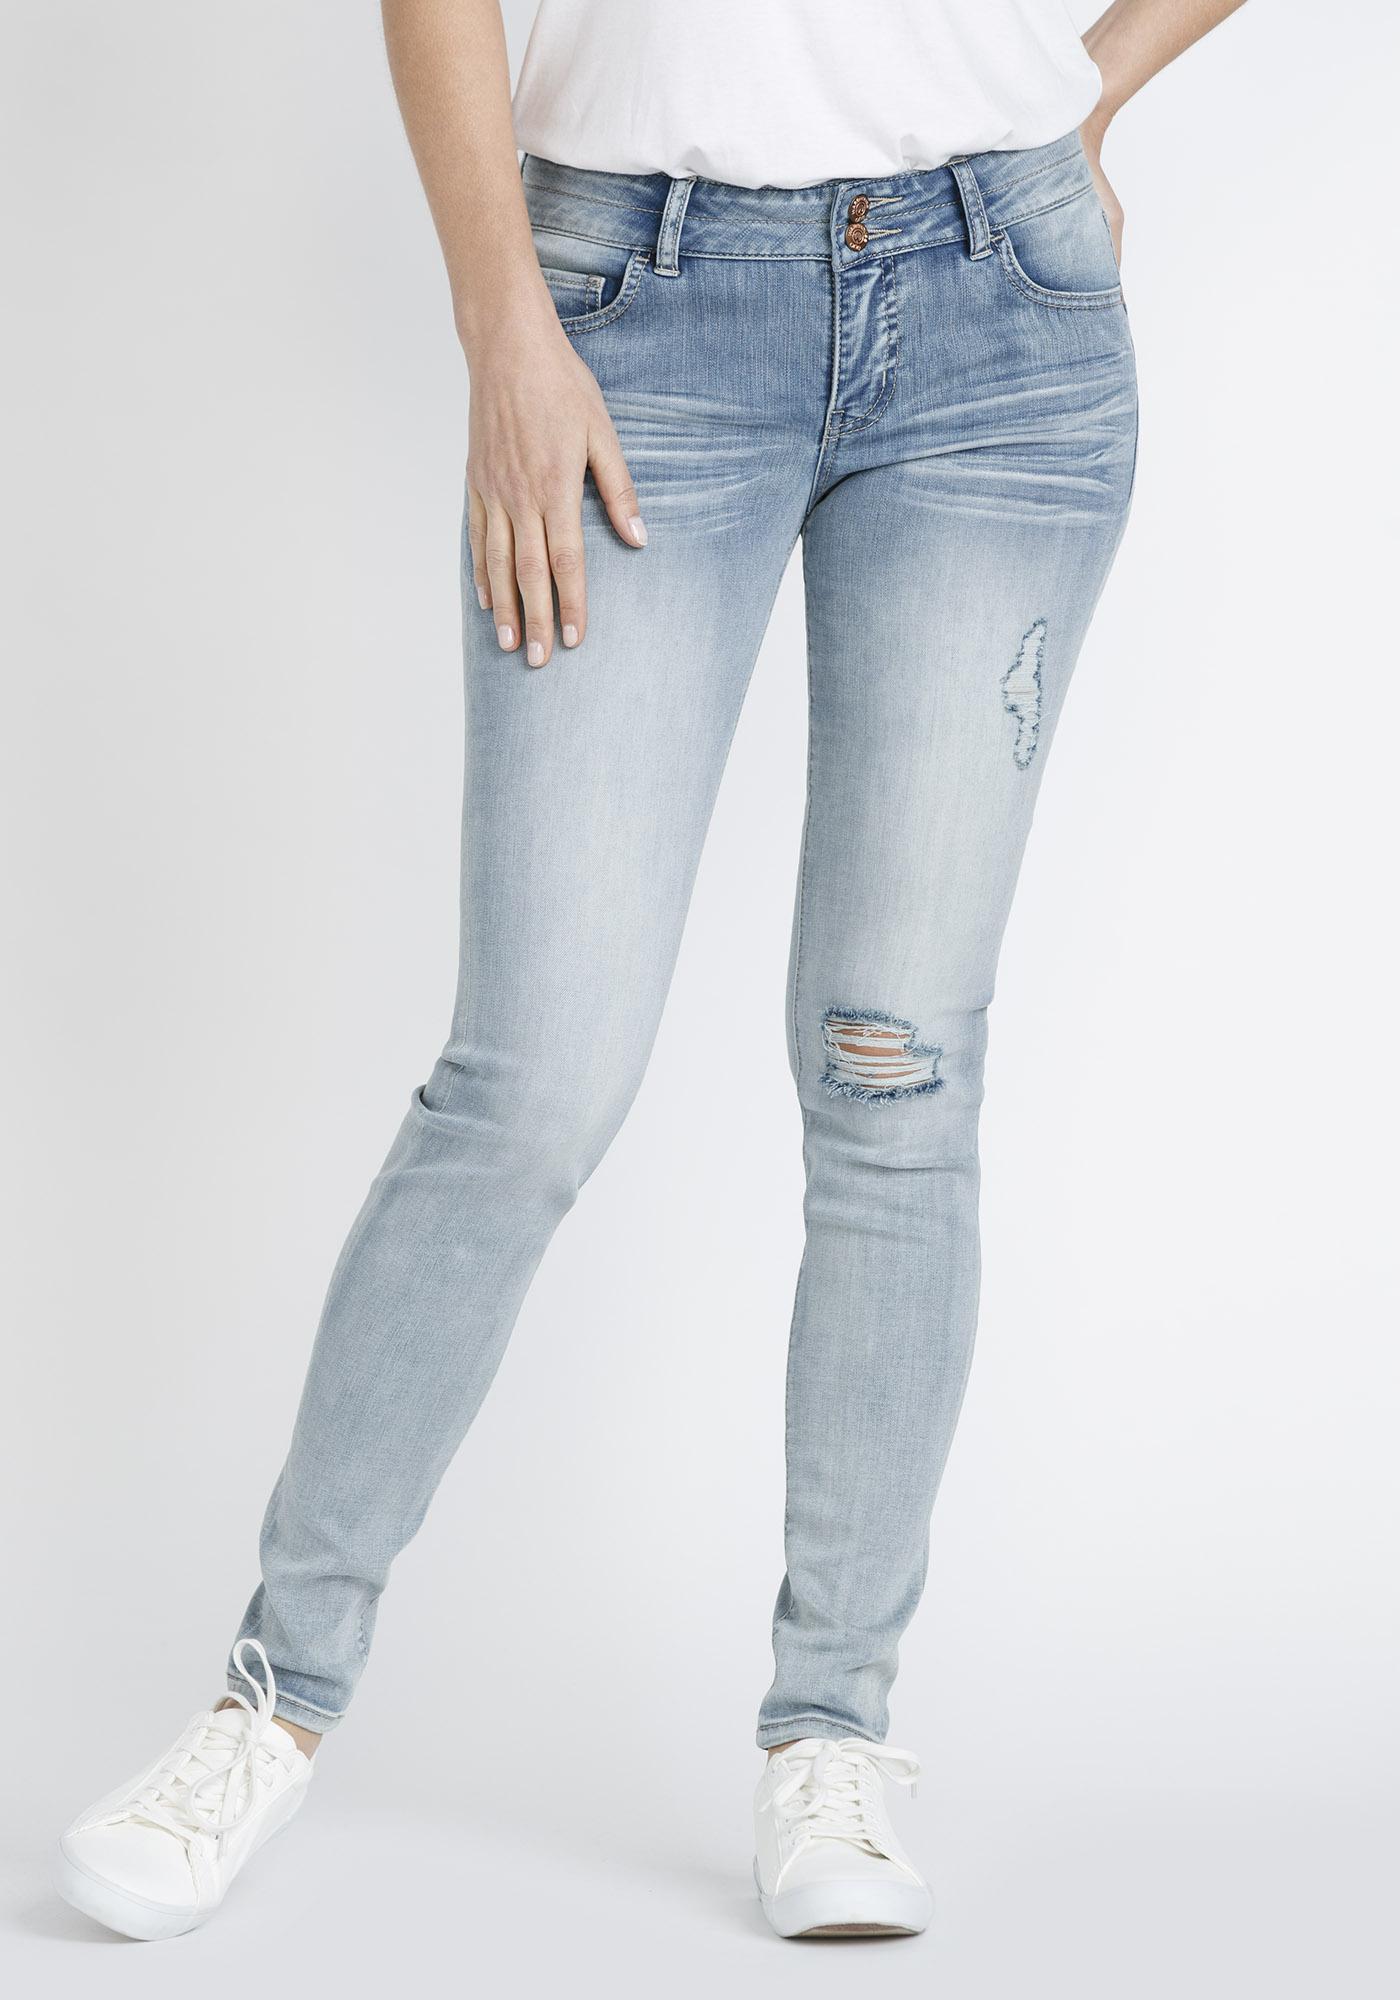 481d557261b Women s Bleach Wash Distressed Skinny Jeans